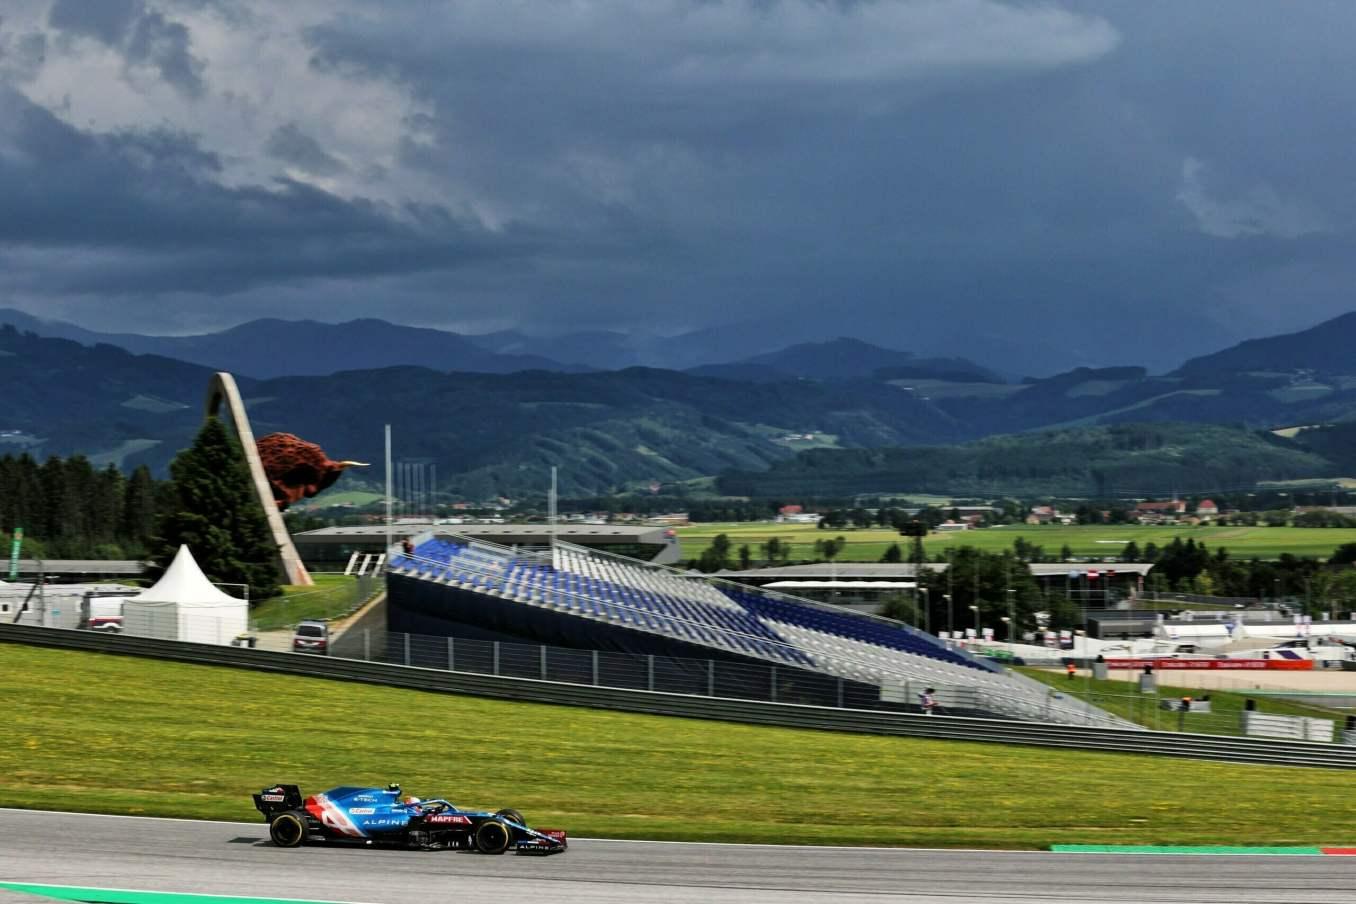 Alpine F1 Team Alonso Ocon Autriche Steiermark Grand Prix Spielberg A521 2021